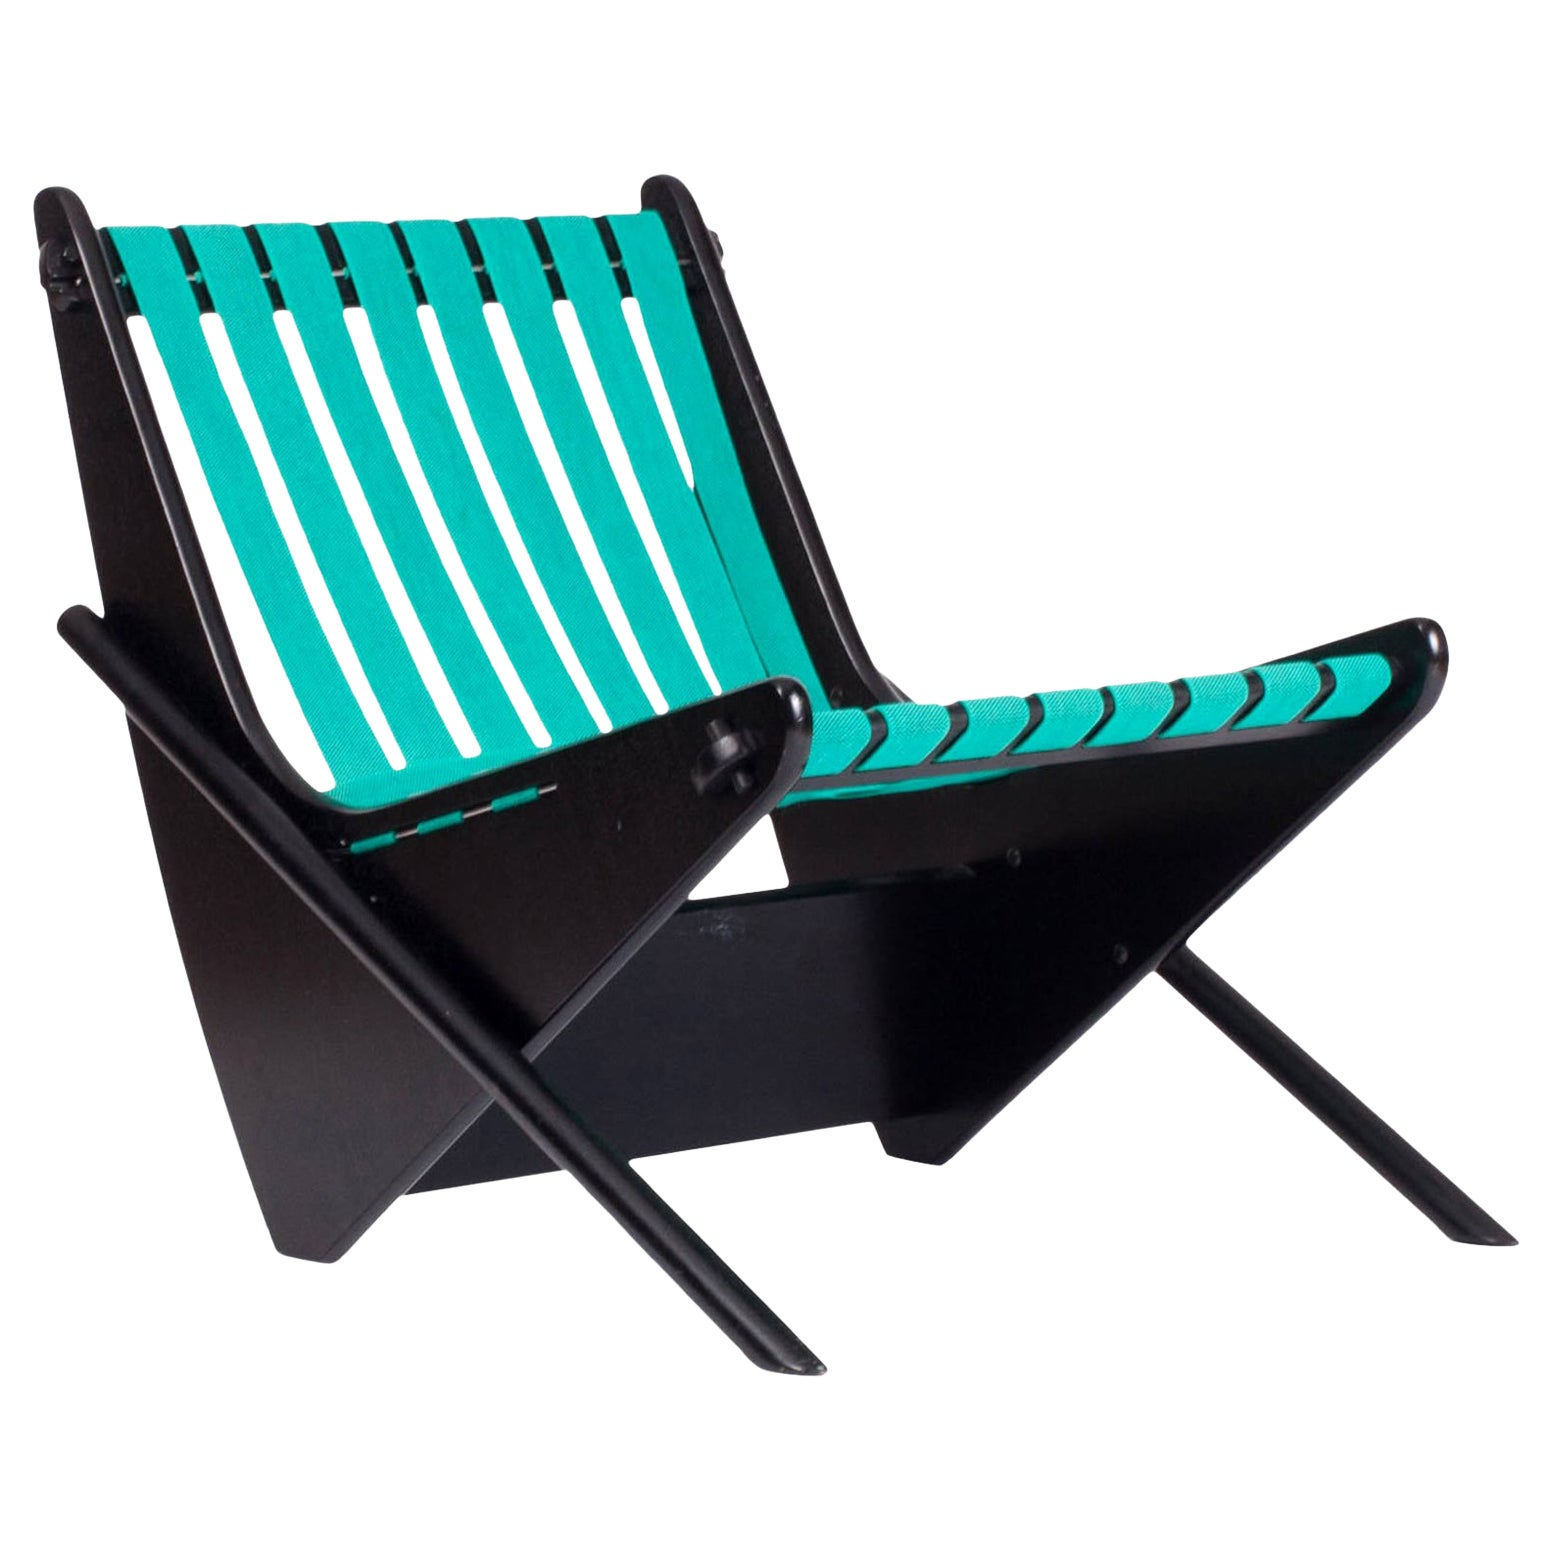 Brazilian Modern 'Boomerang' Lounge Chair by Richard Neutra